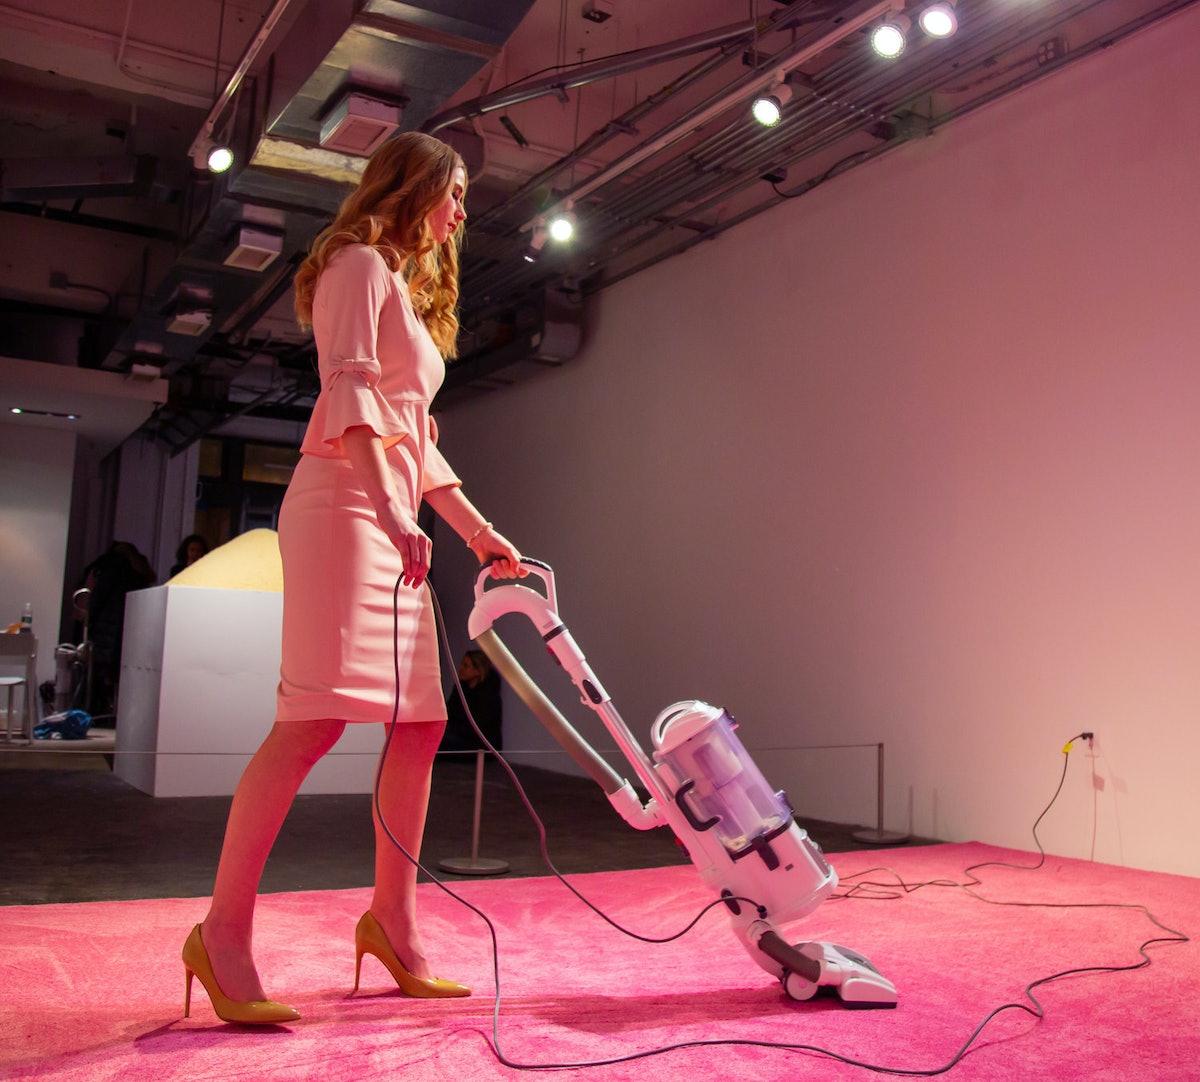 ivanka-vacuuming-2.jpg